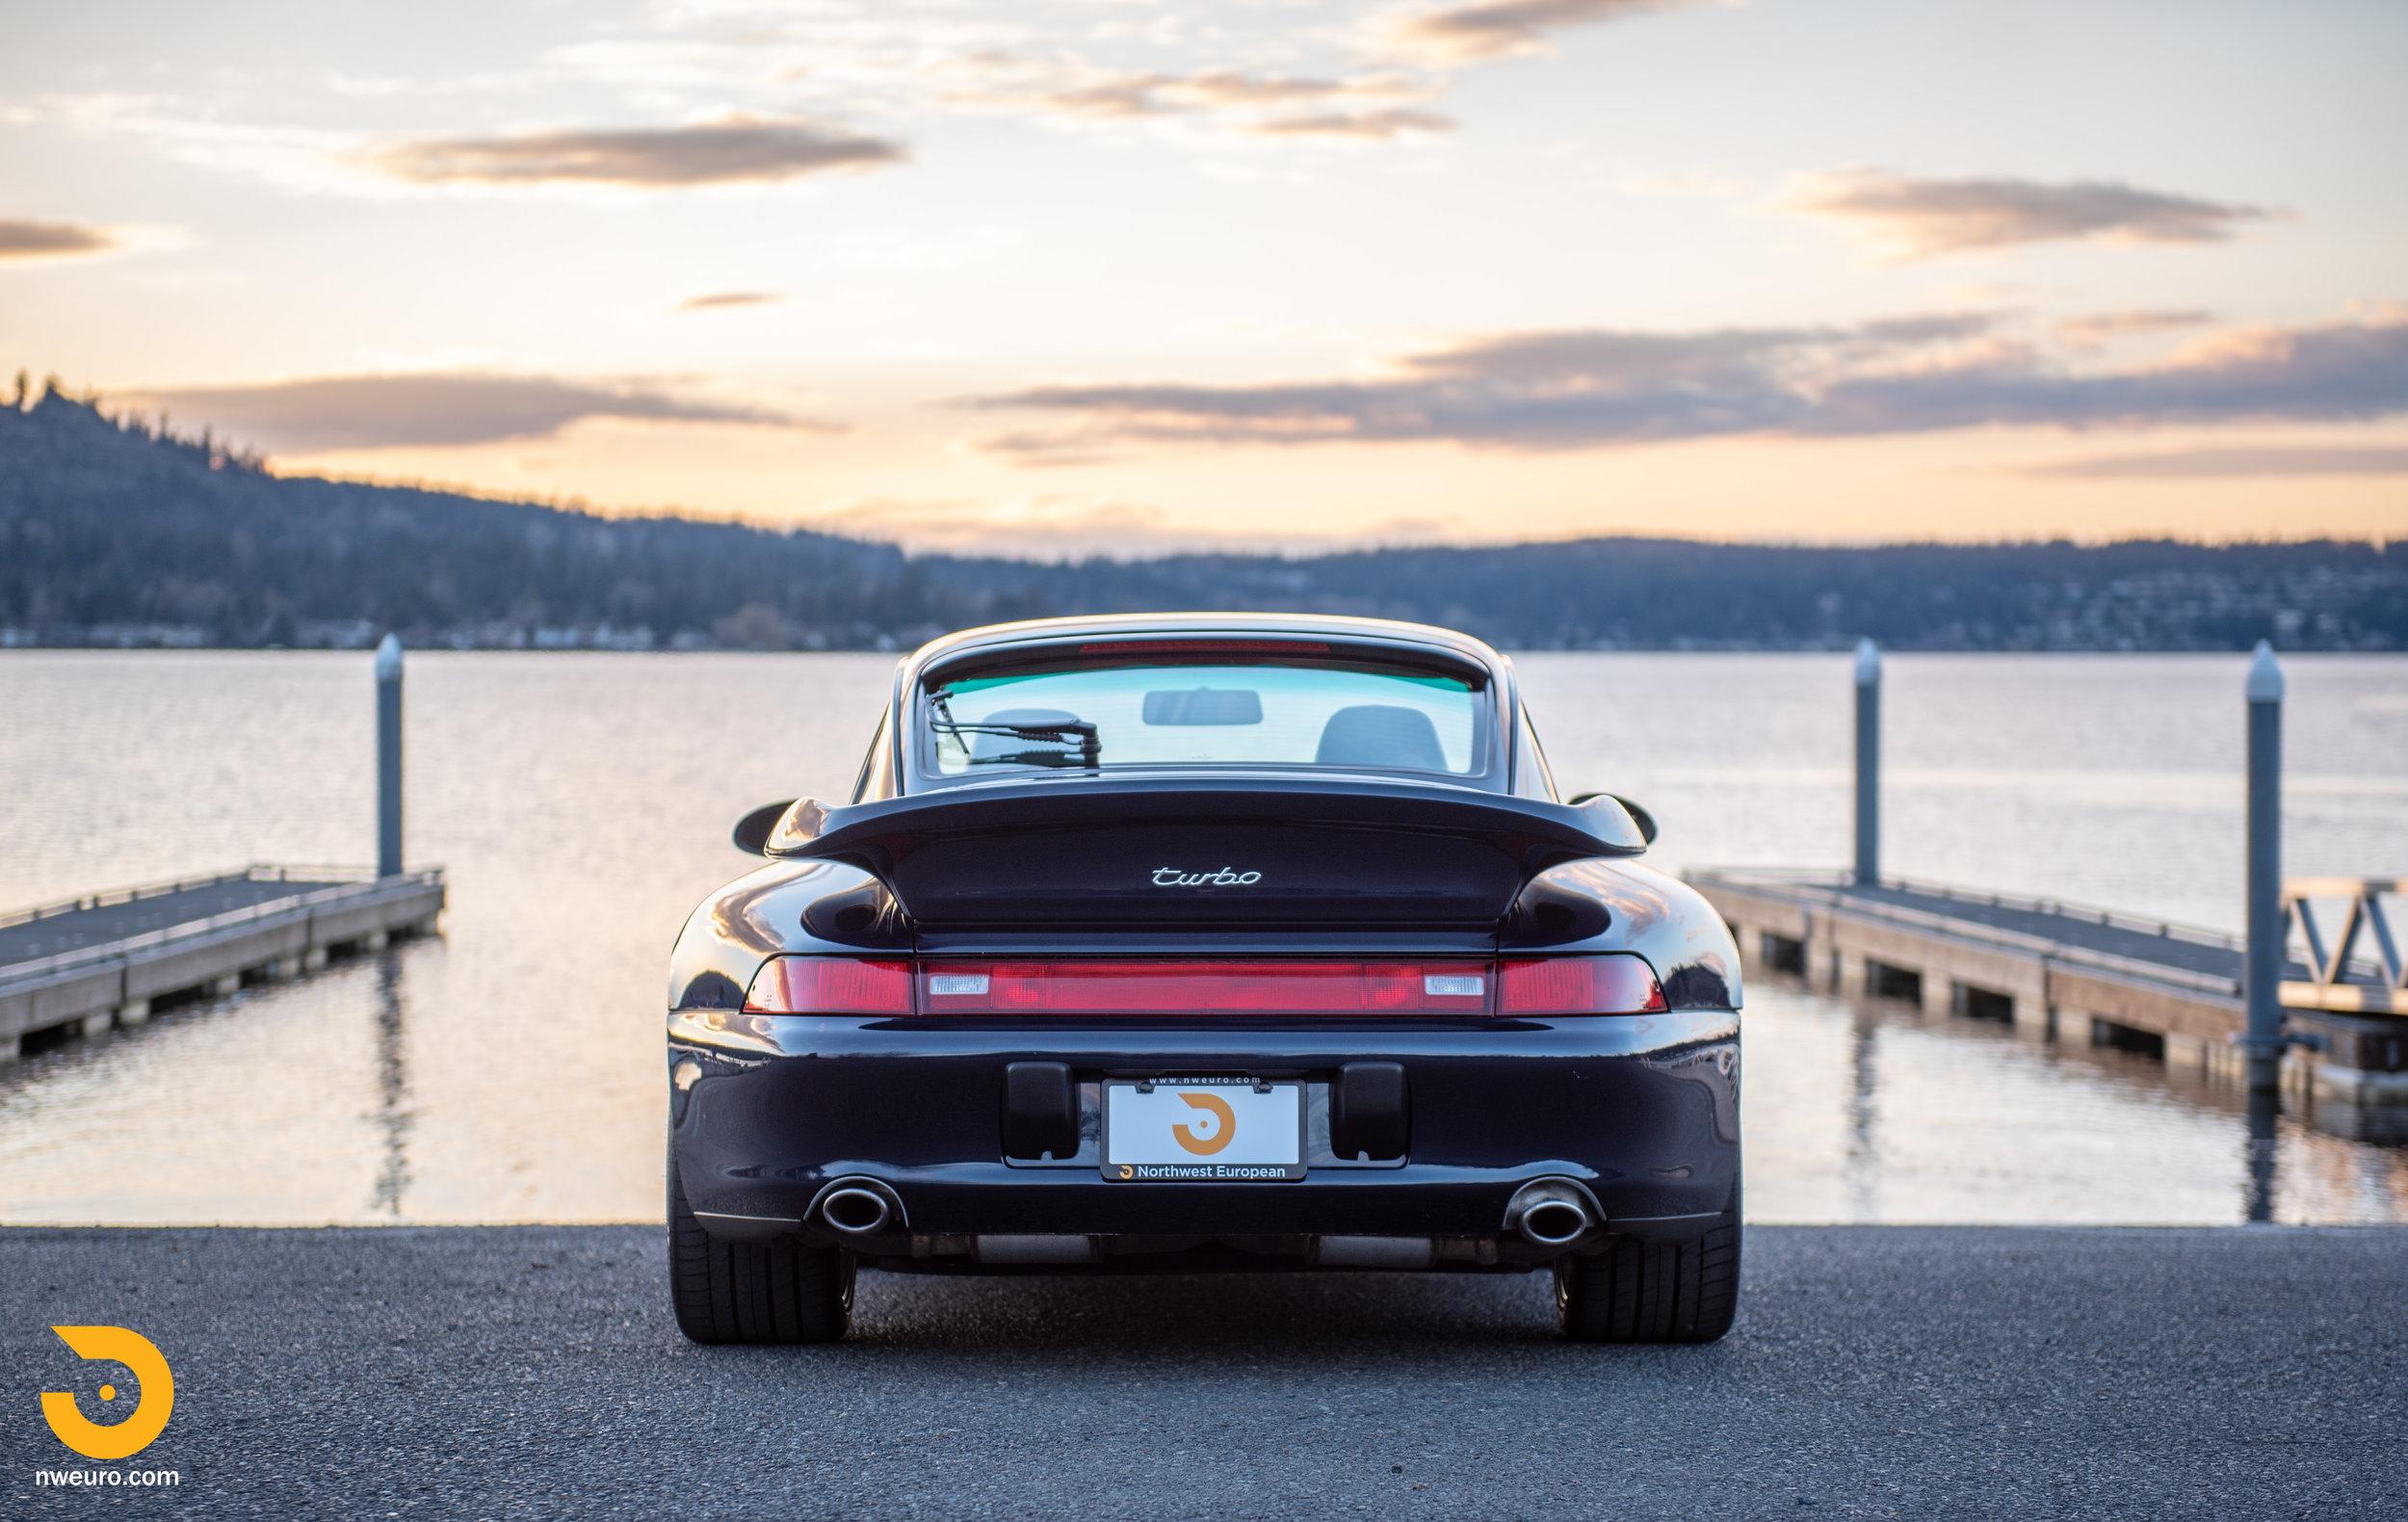 1997 Porsche 993 Turbo Ocean Blue-53.jpg